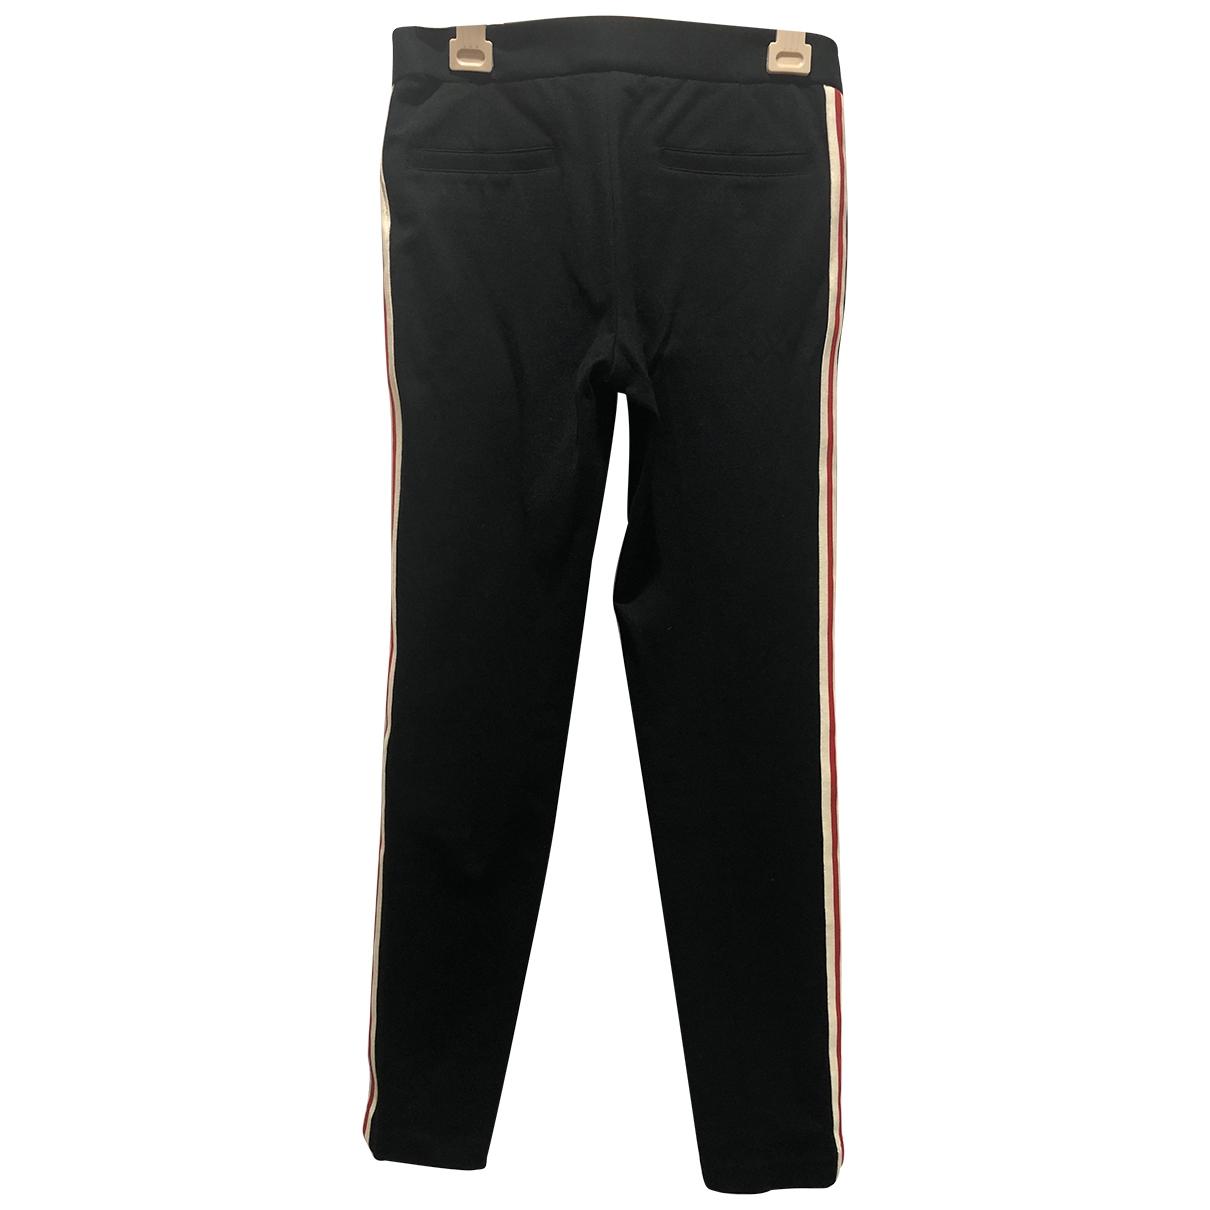 Lauren Ralph Lauren \N Black Trousers for Women XS International